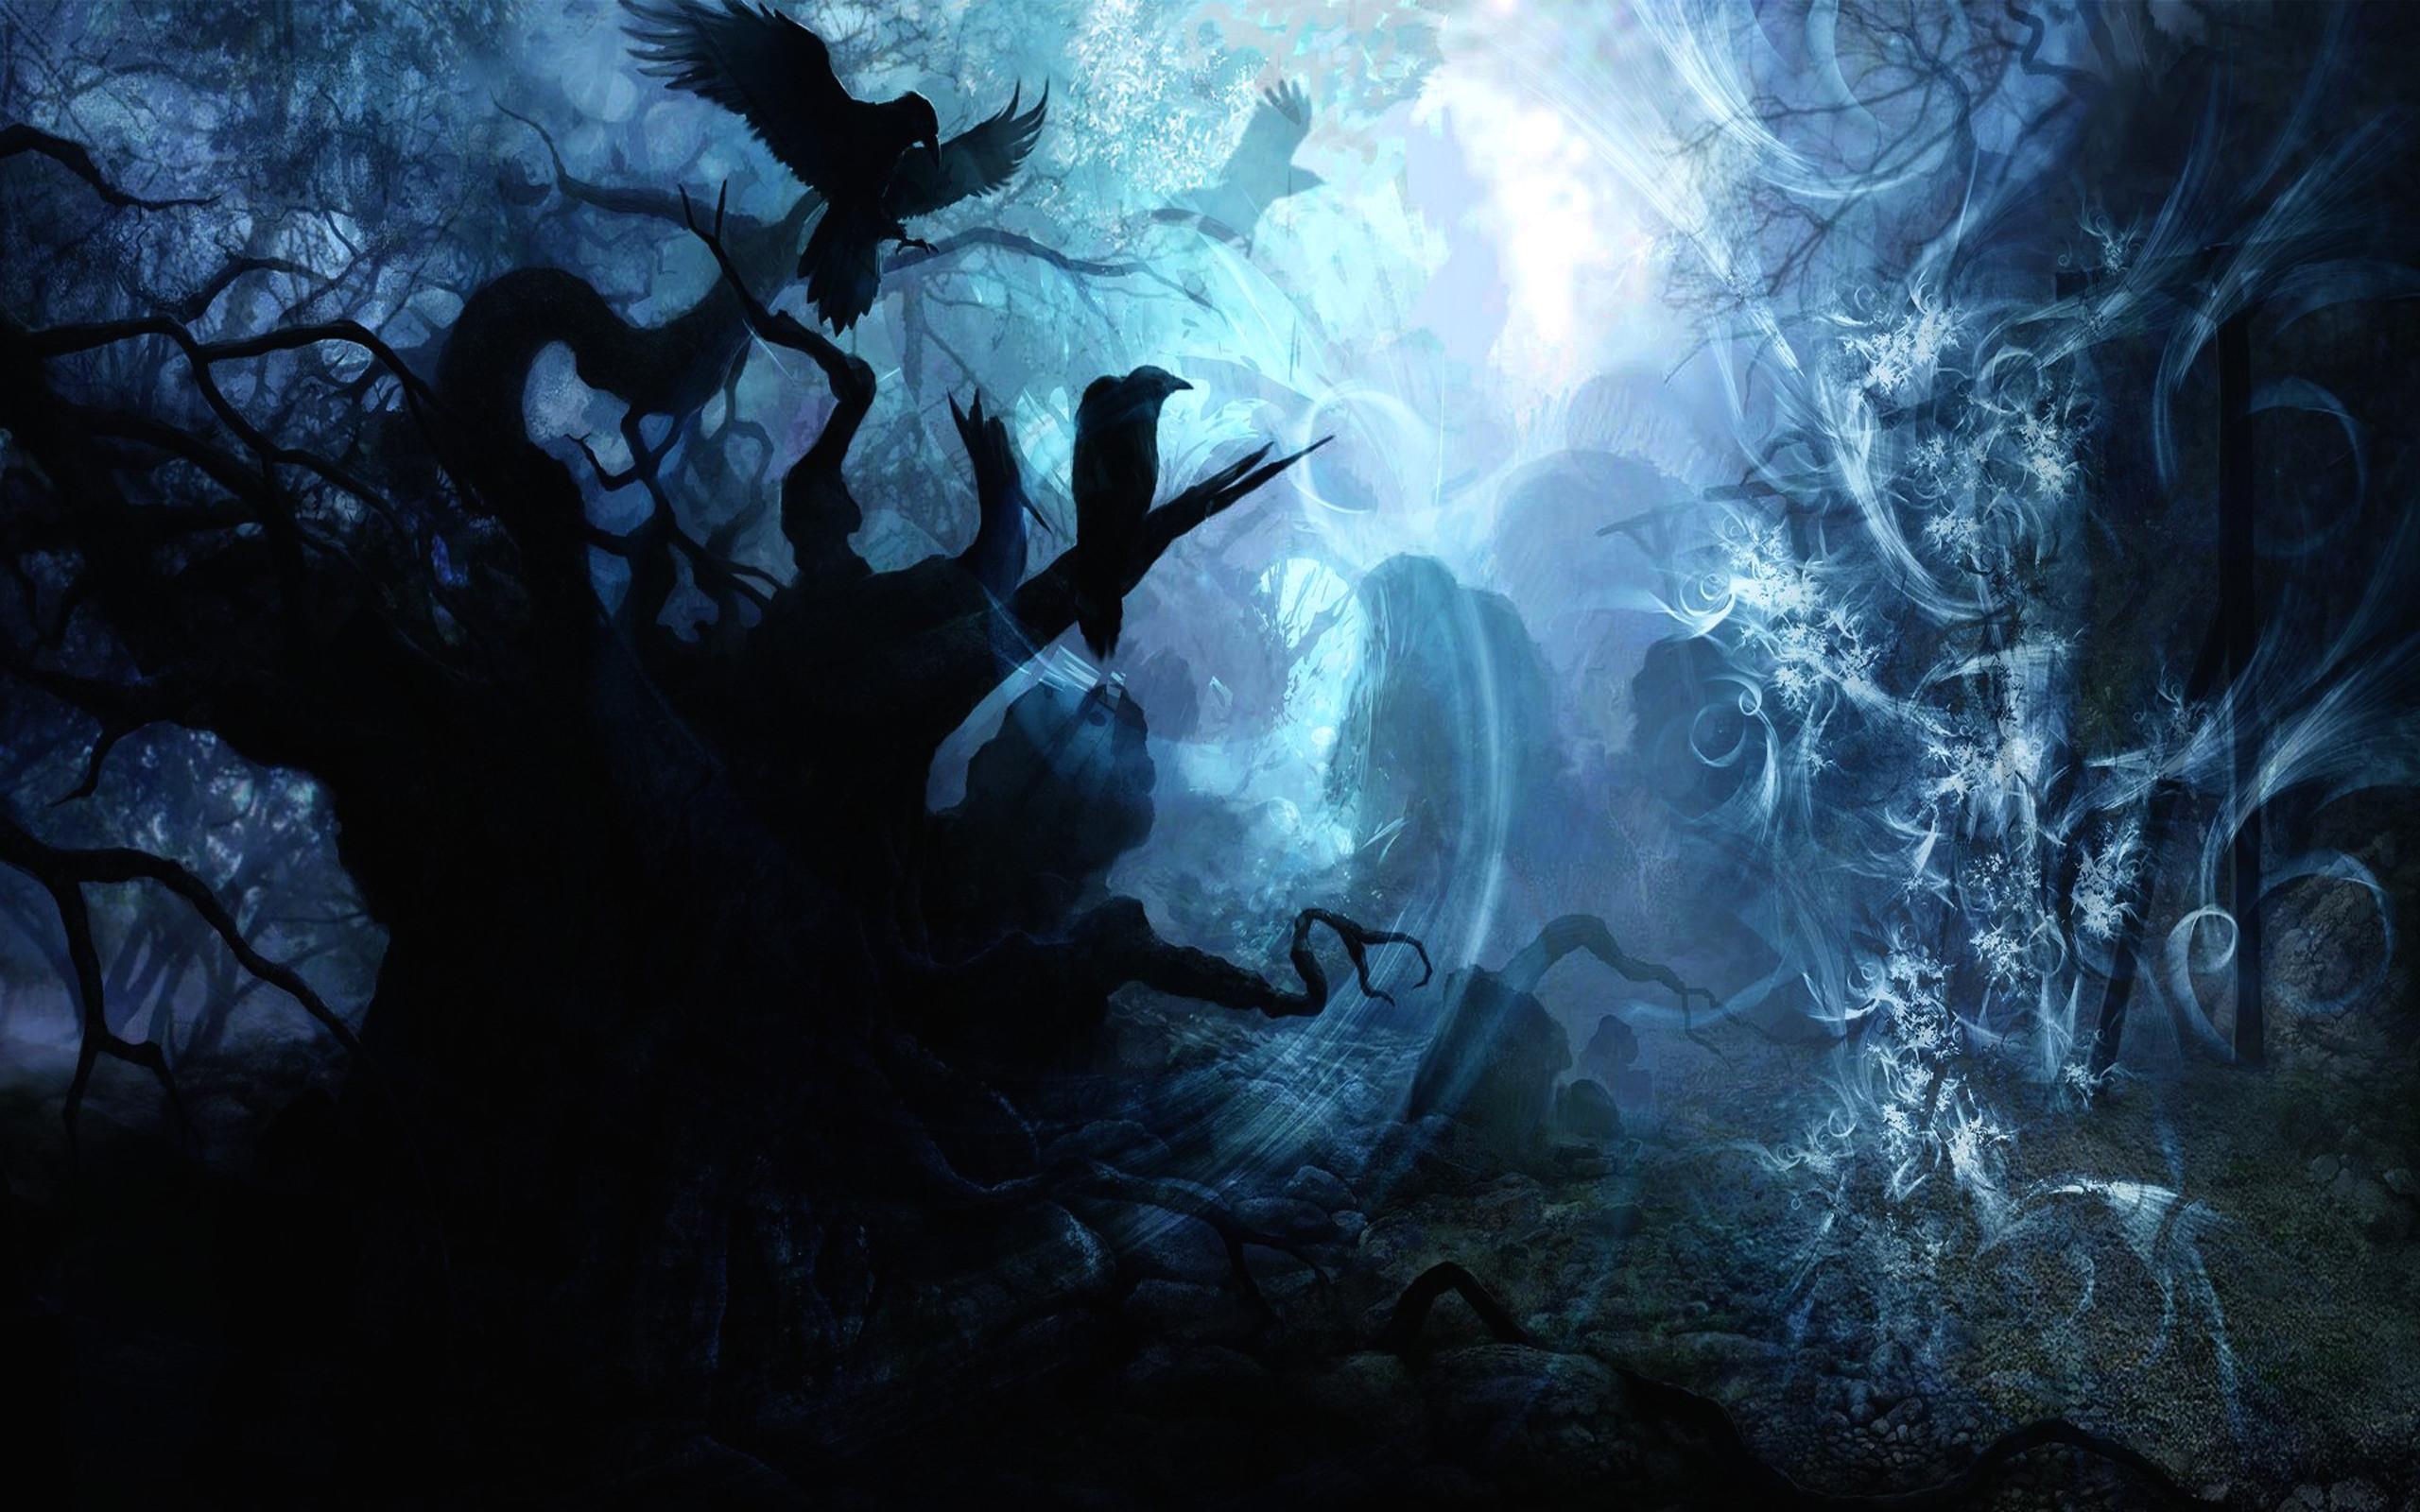 Dark Fantasy Background (71 Wallpapers)